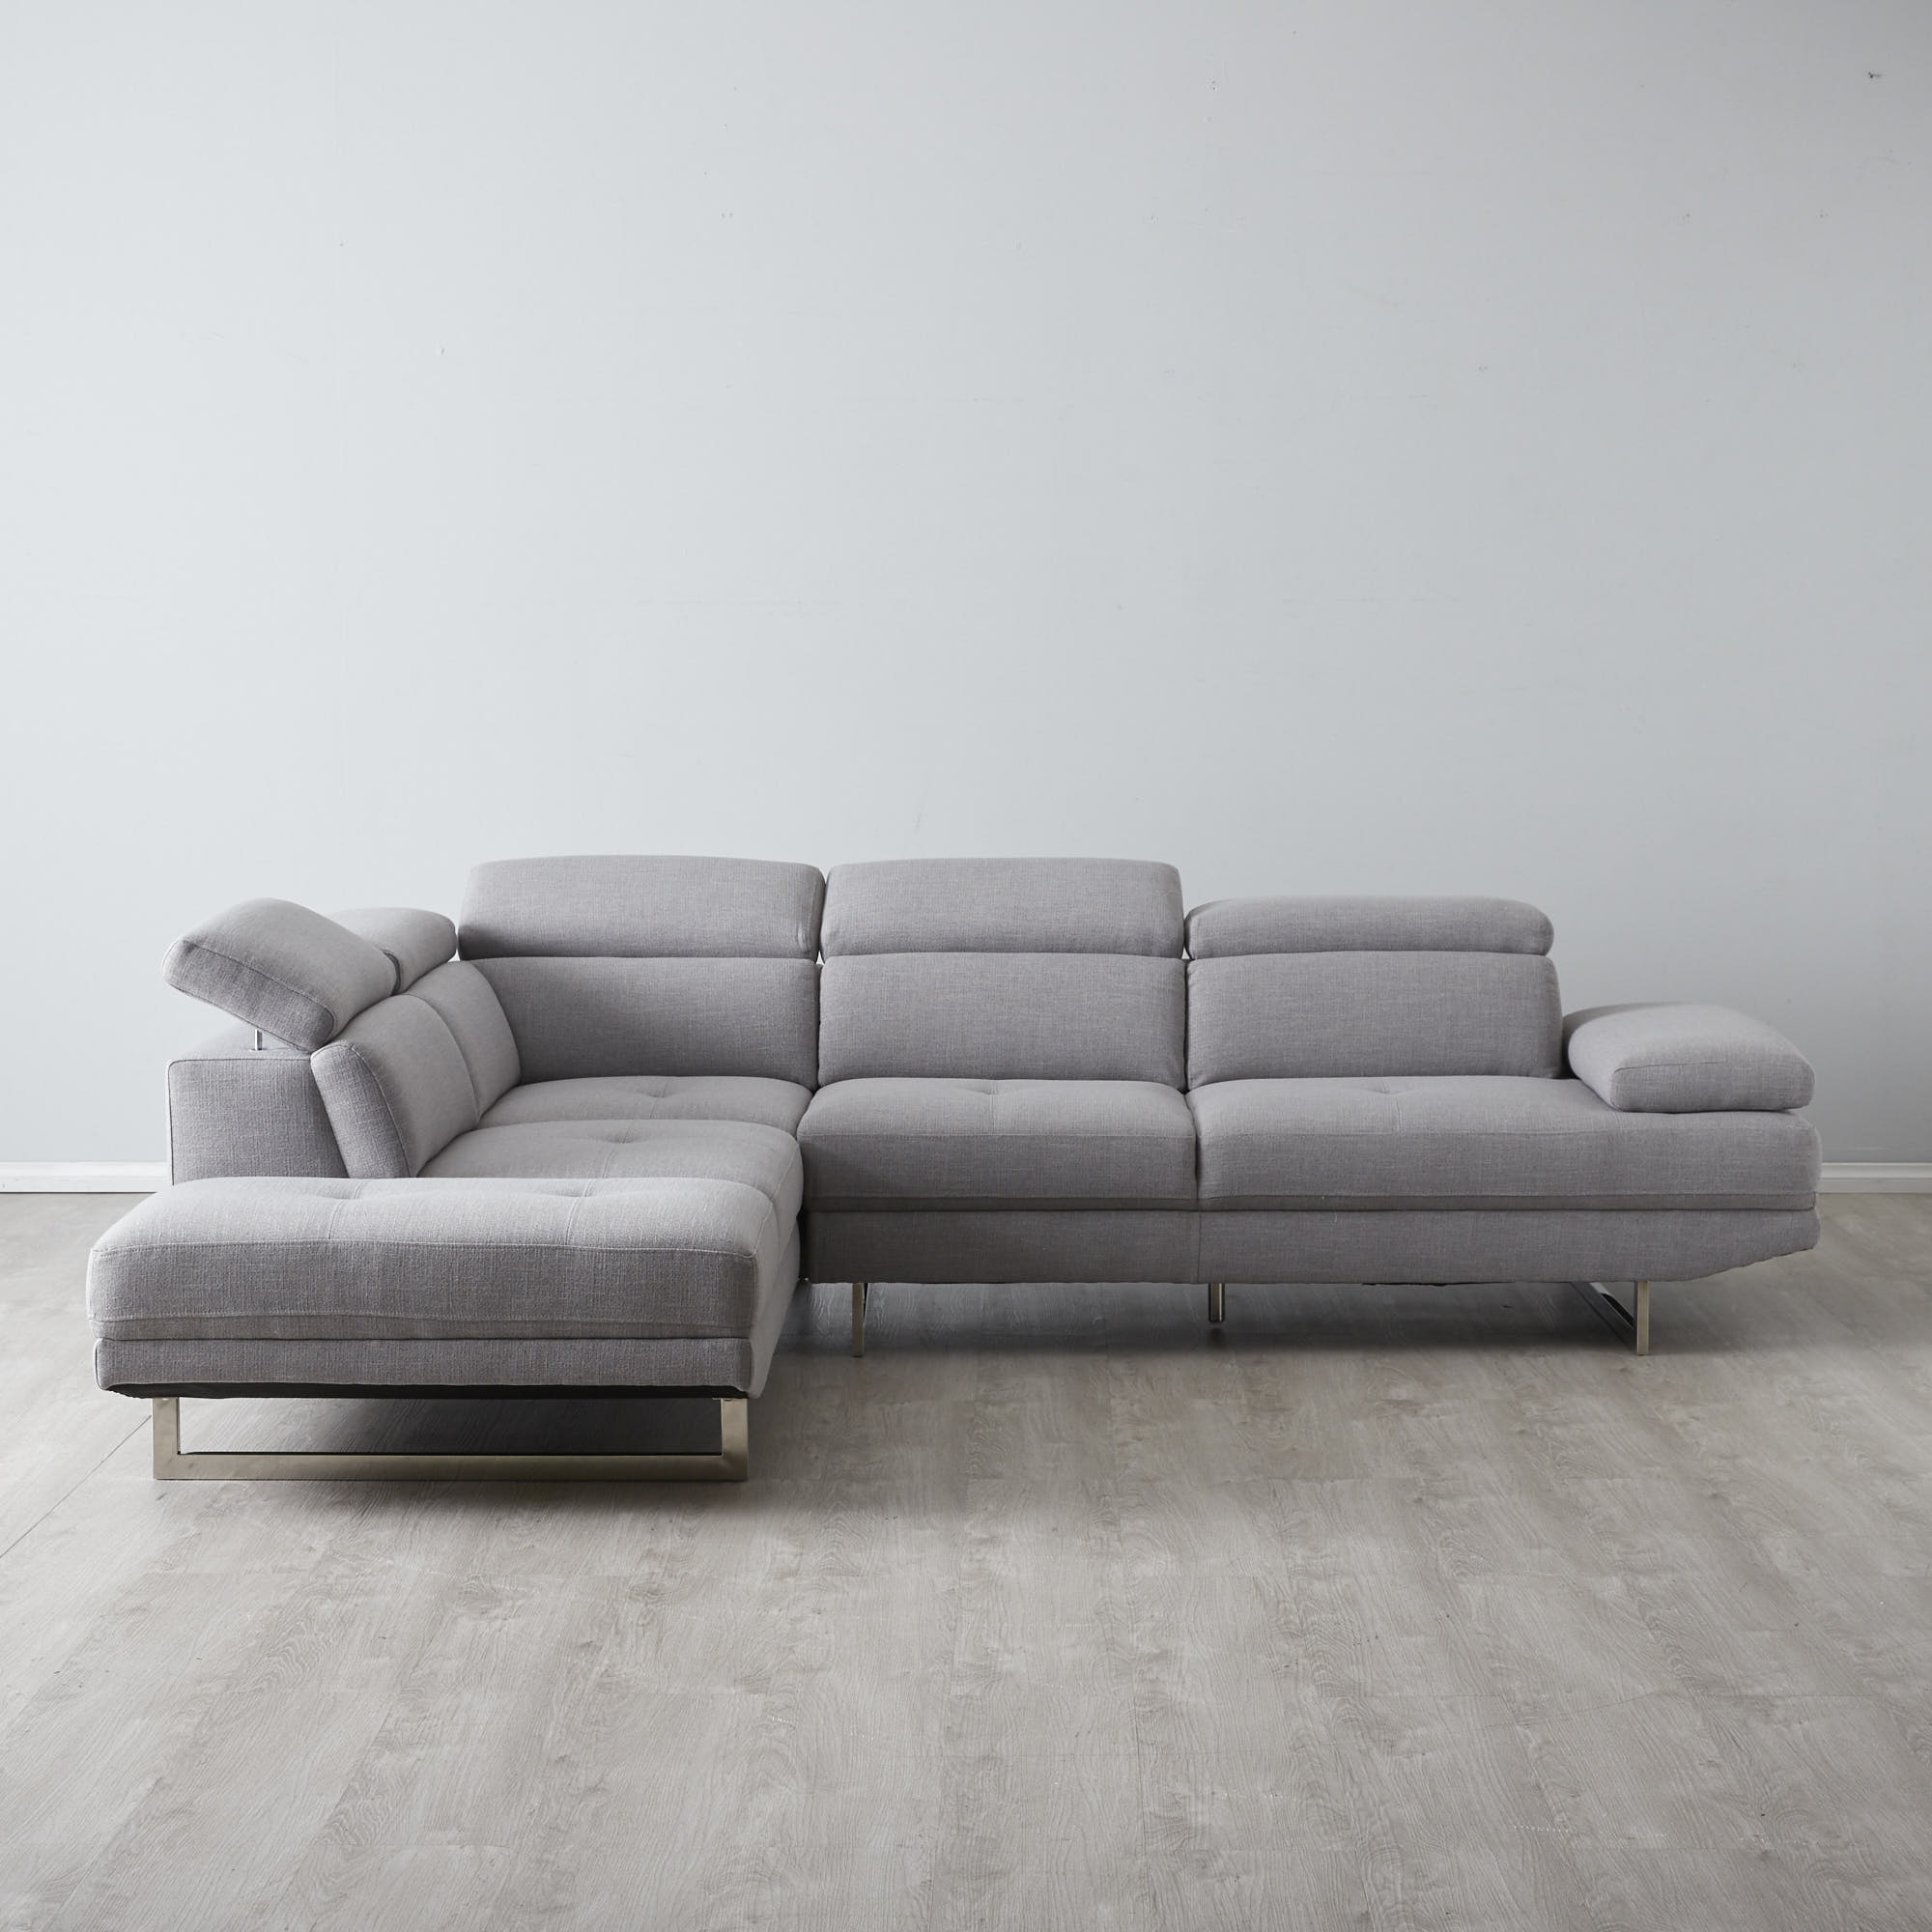 Antoine Modular Left Chaise Lounge